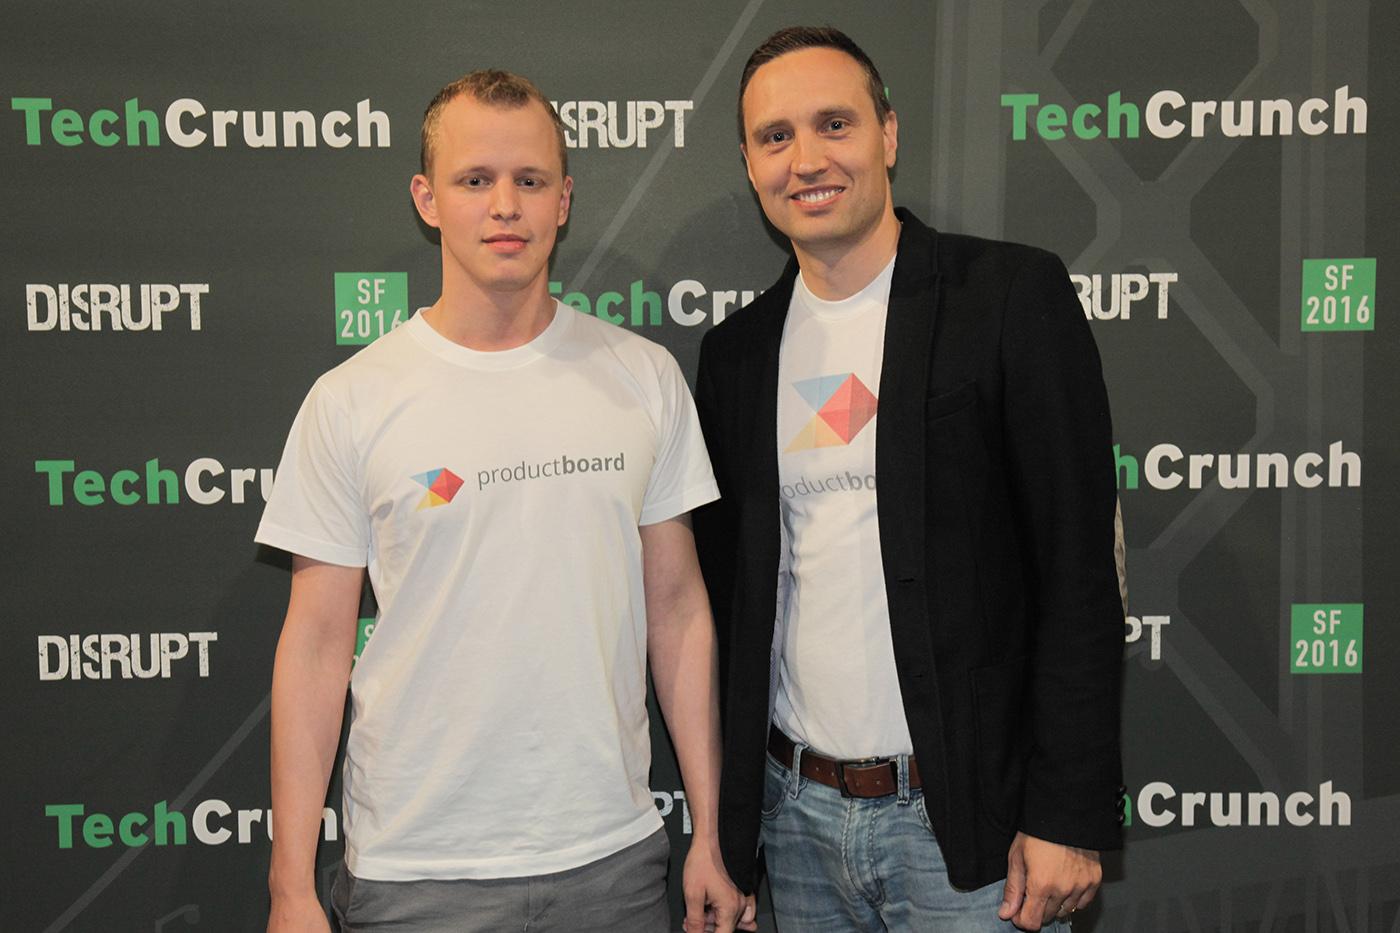 Zakladatelé ProductBoard: Daniel Hejl a Hubert Palan